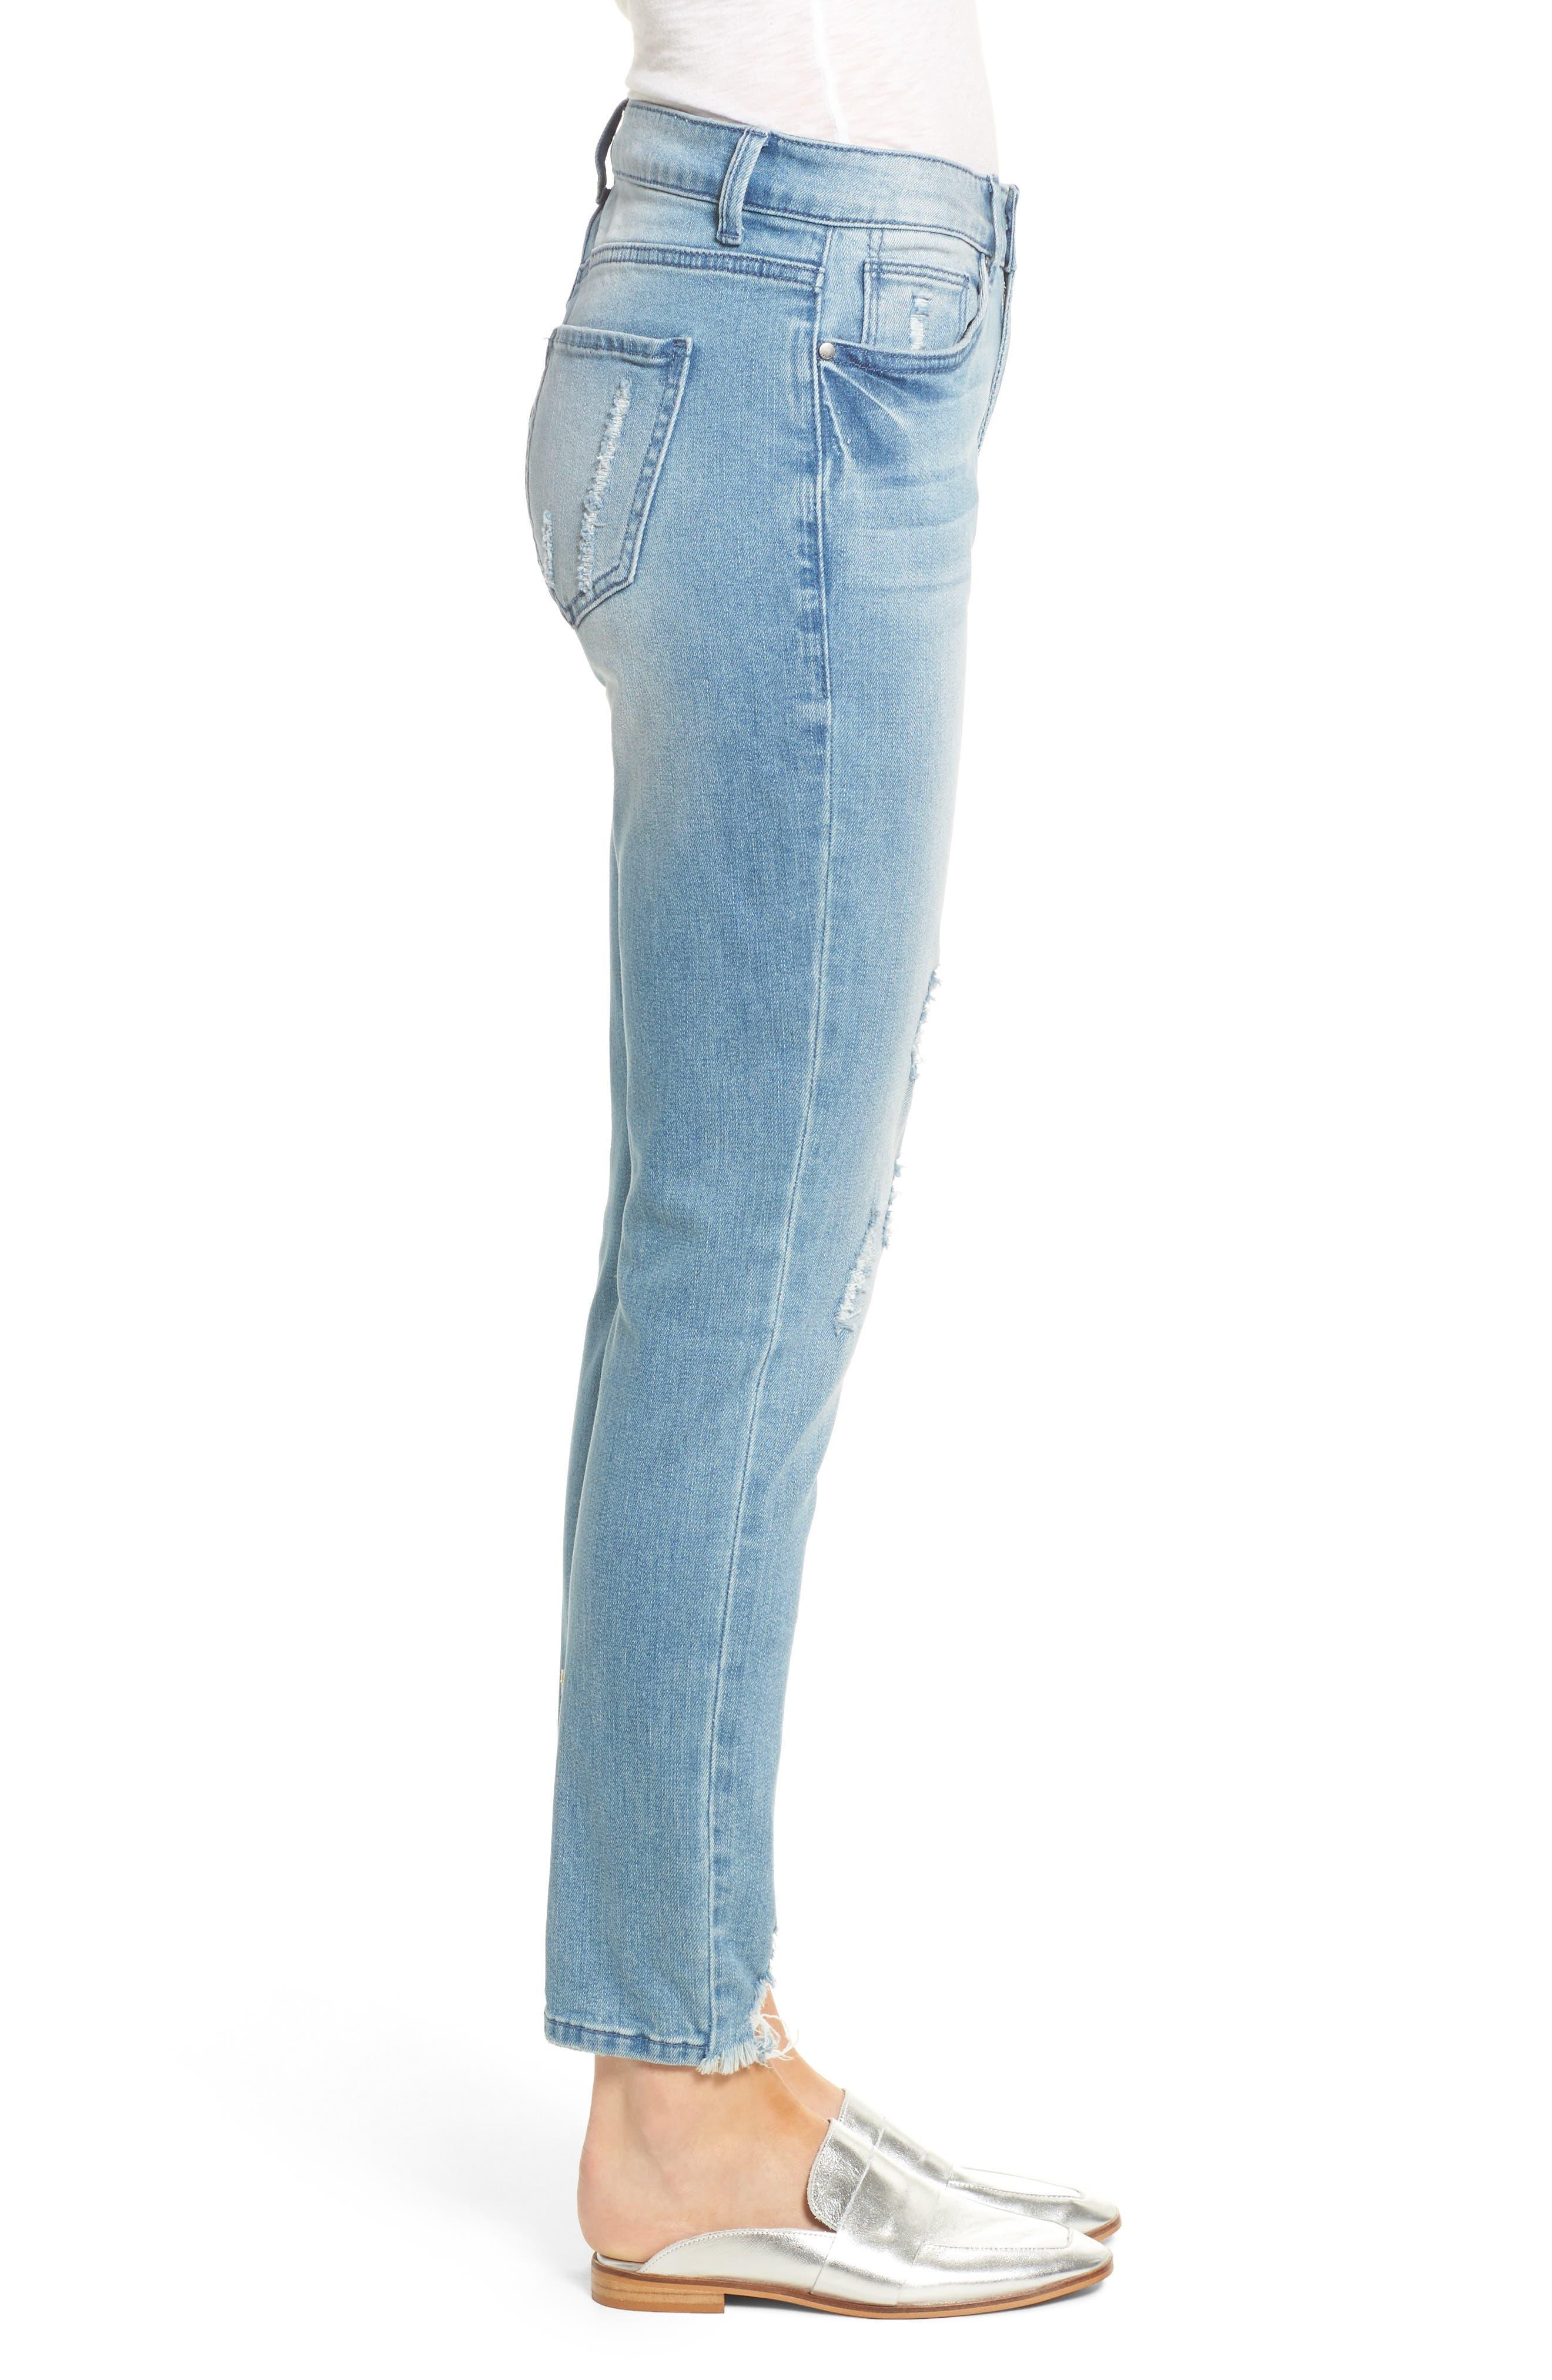 Verona Skinny Jeans,                             Alternate thumbnail 3, color,